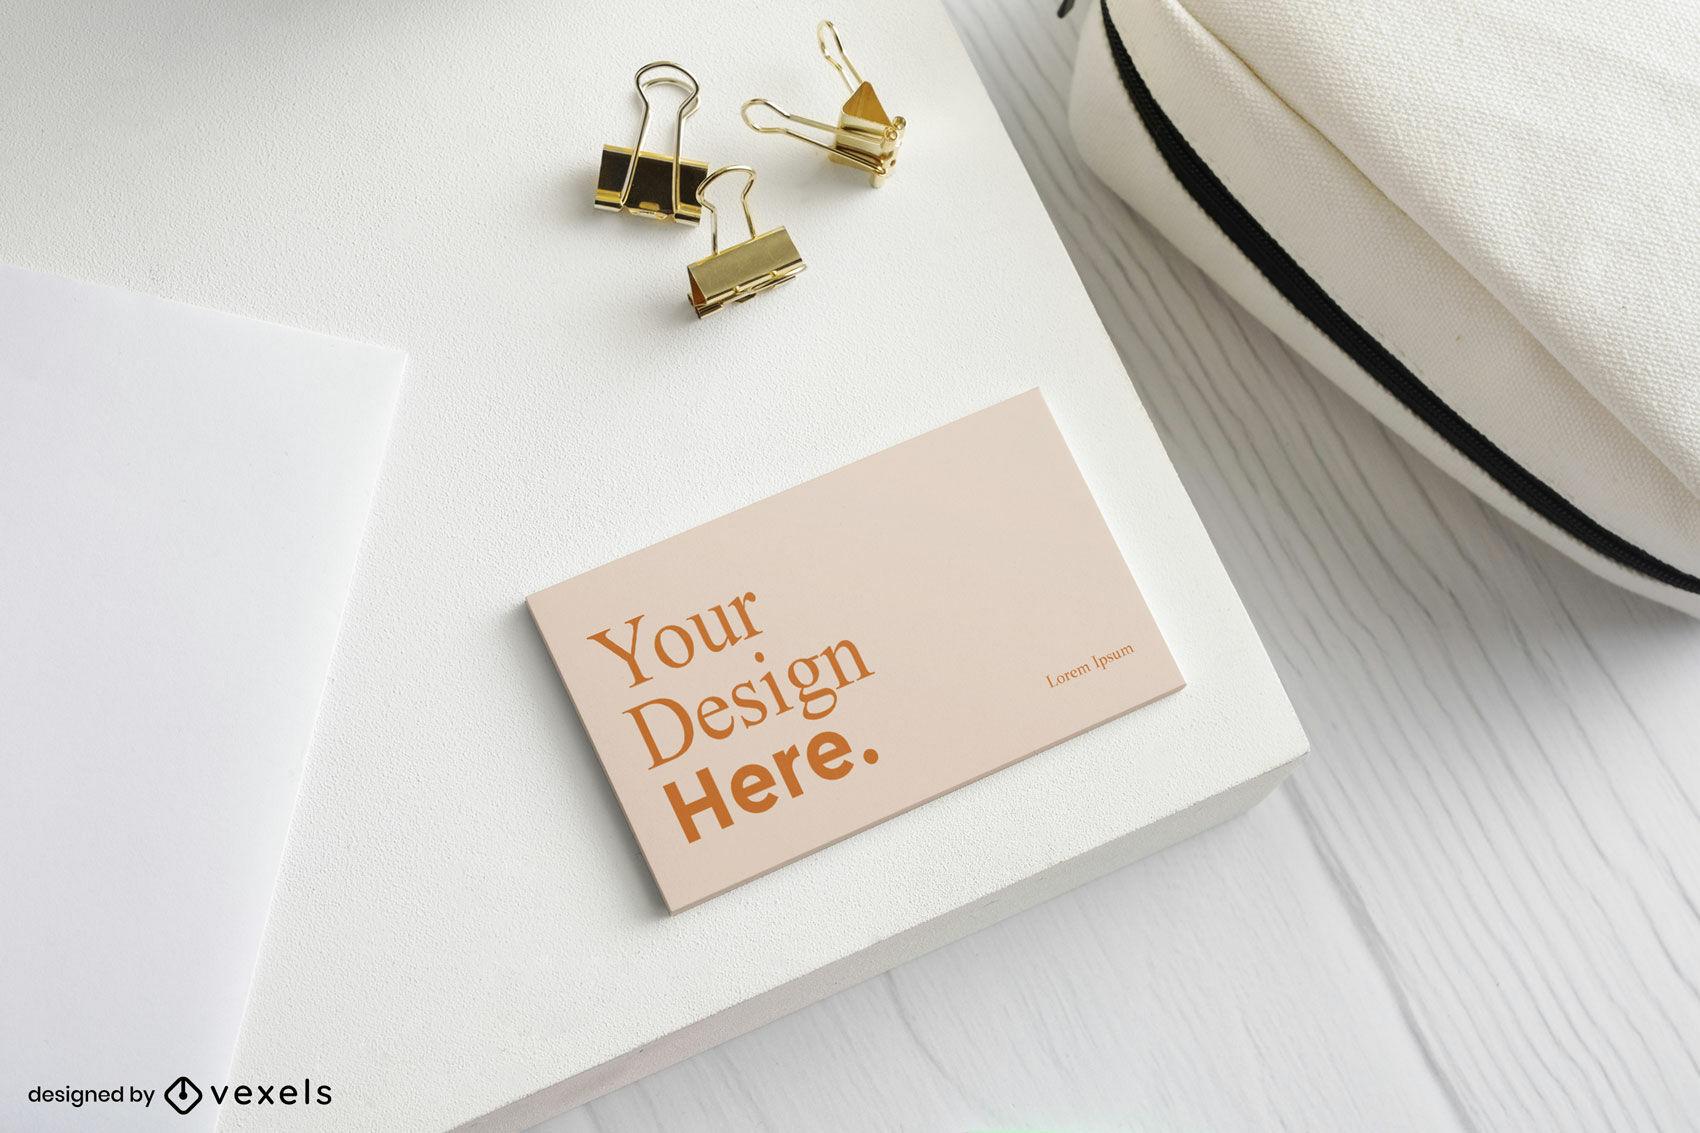 Maqueta de tarjeta de visita naranja en escritorio blanco